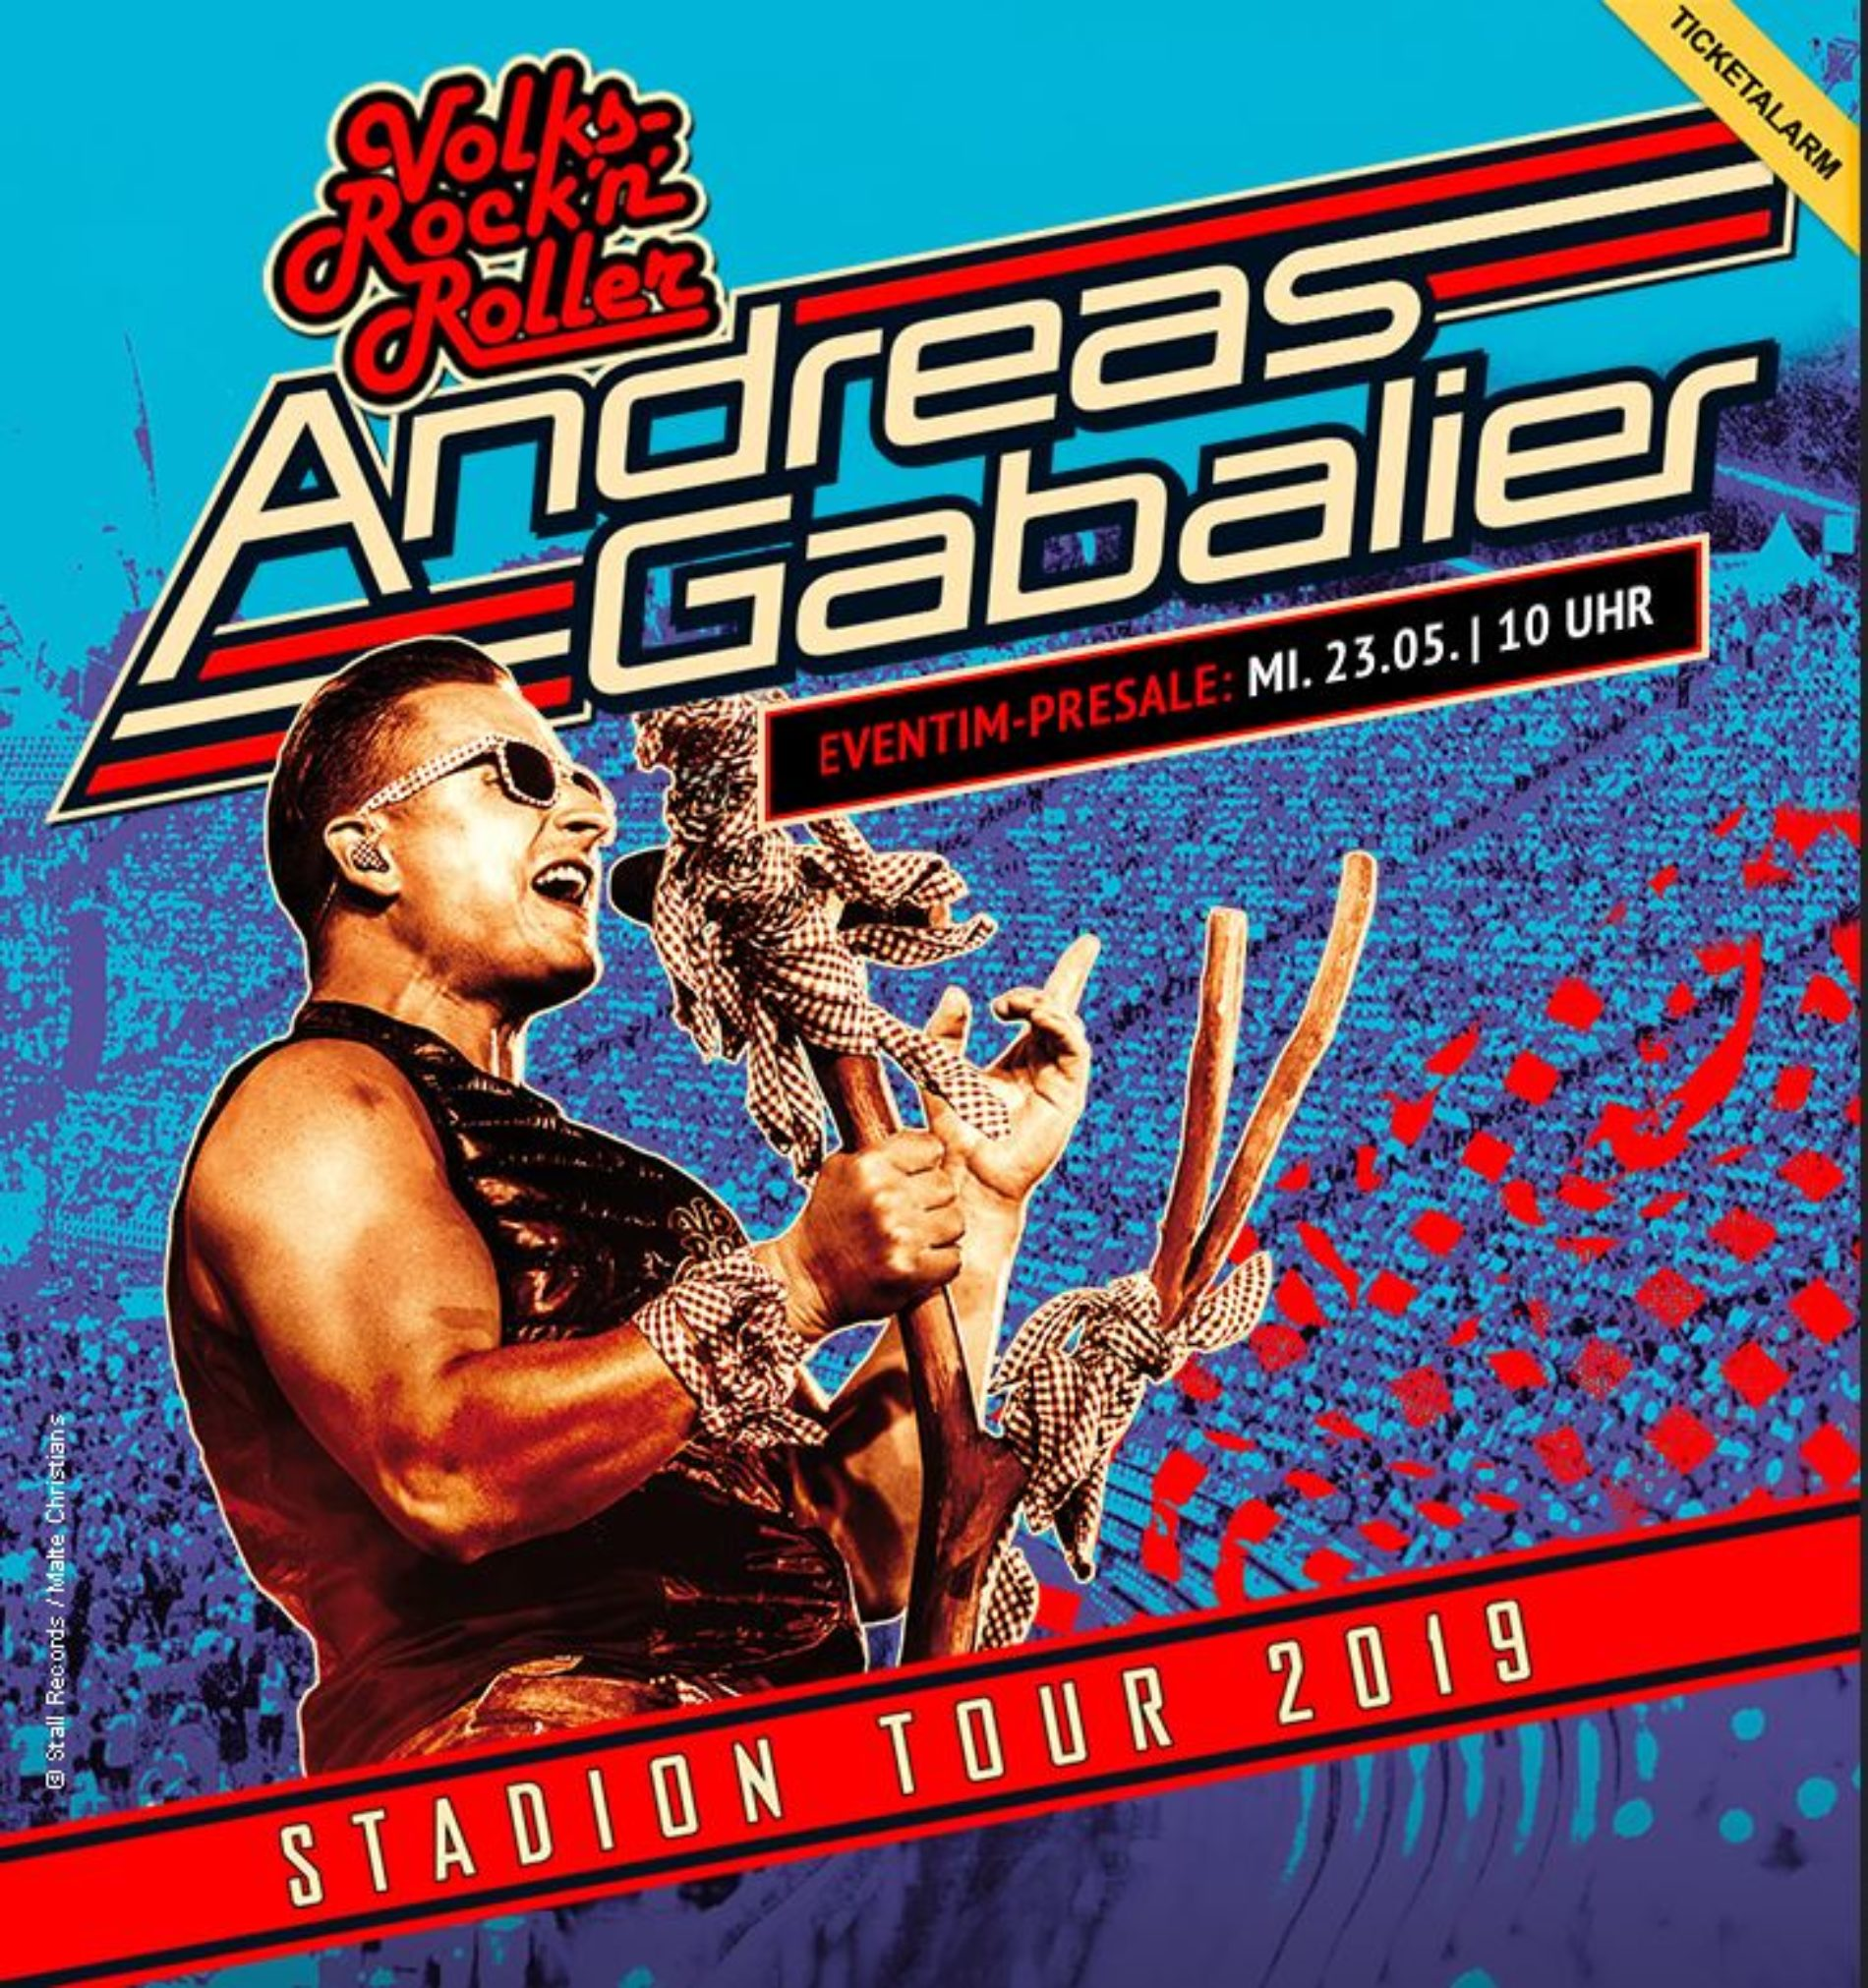 Andreas Gabalier auf Stadiontour 2019